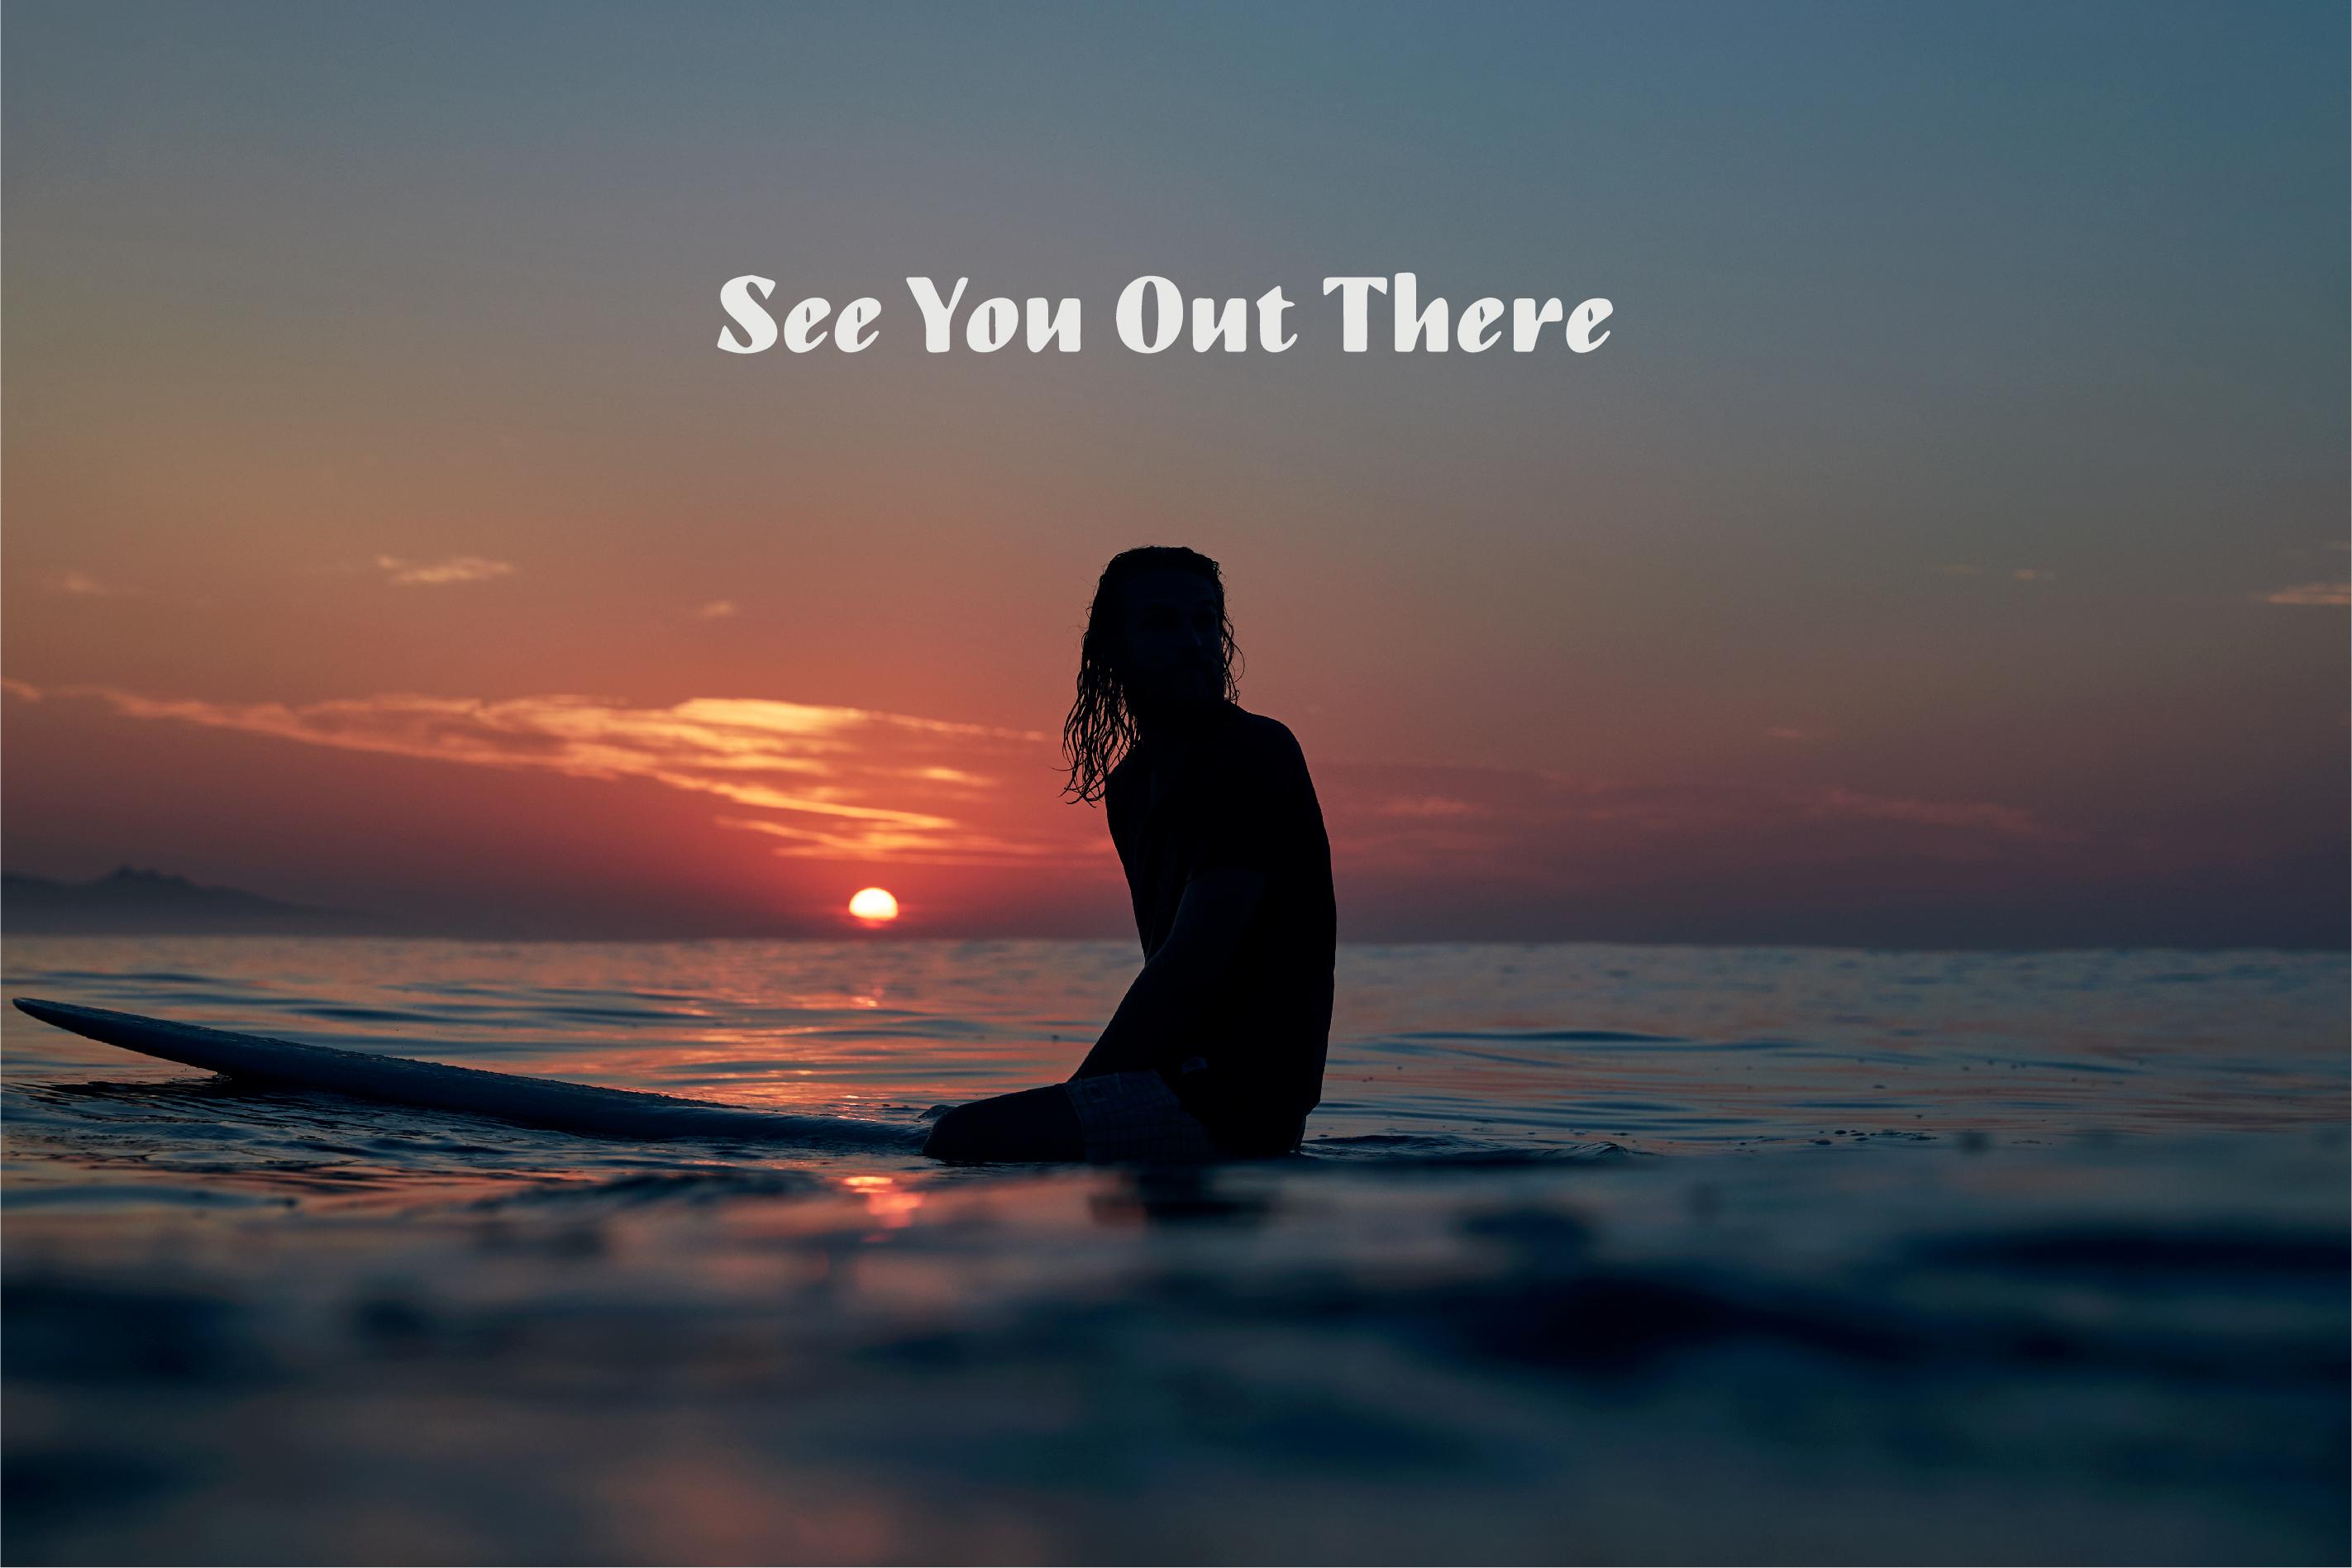 Surf Apparel – Trunks, Shorts, Shirts, Hats | Katin USA